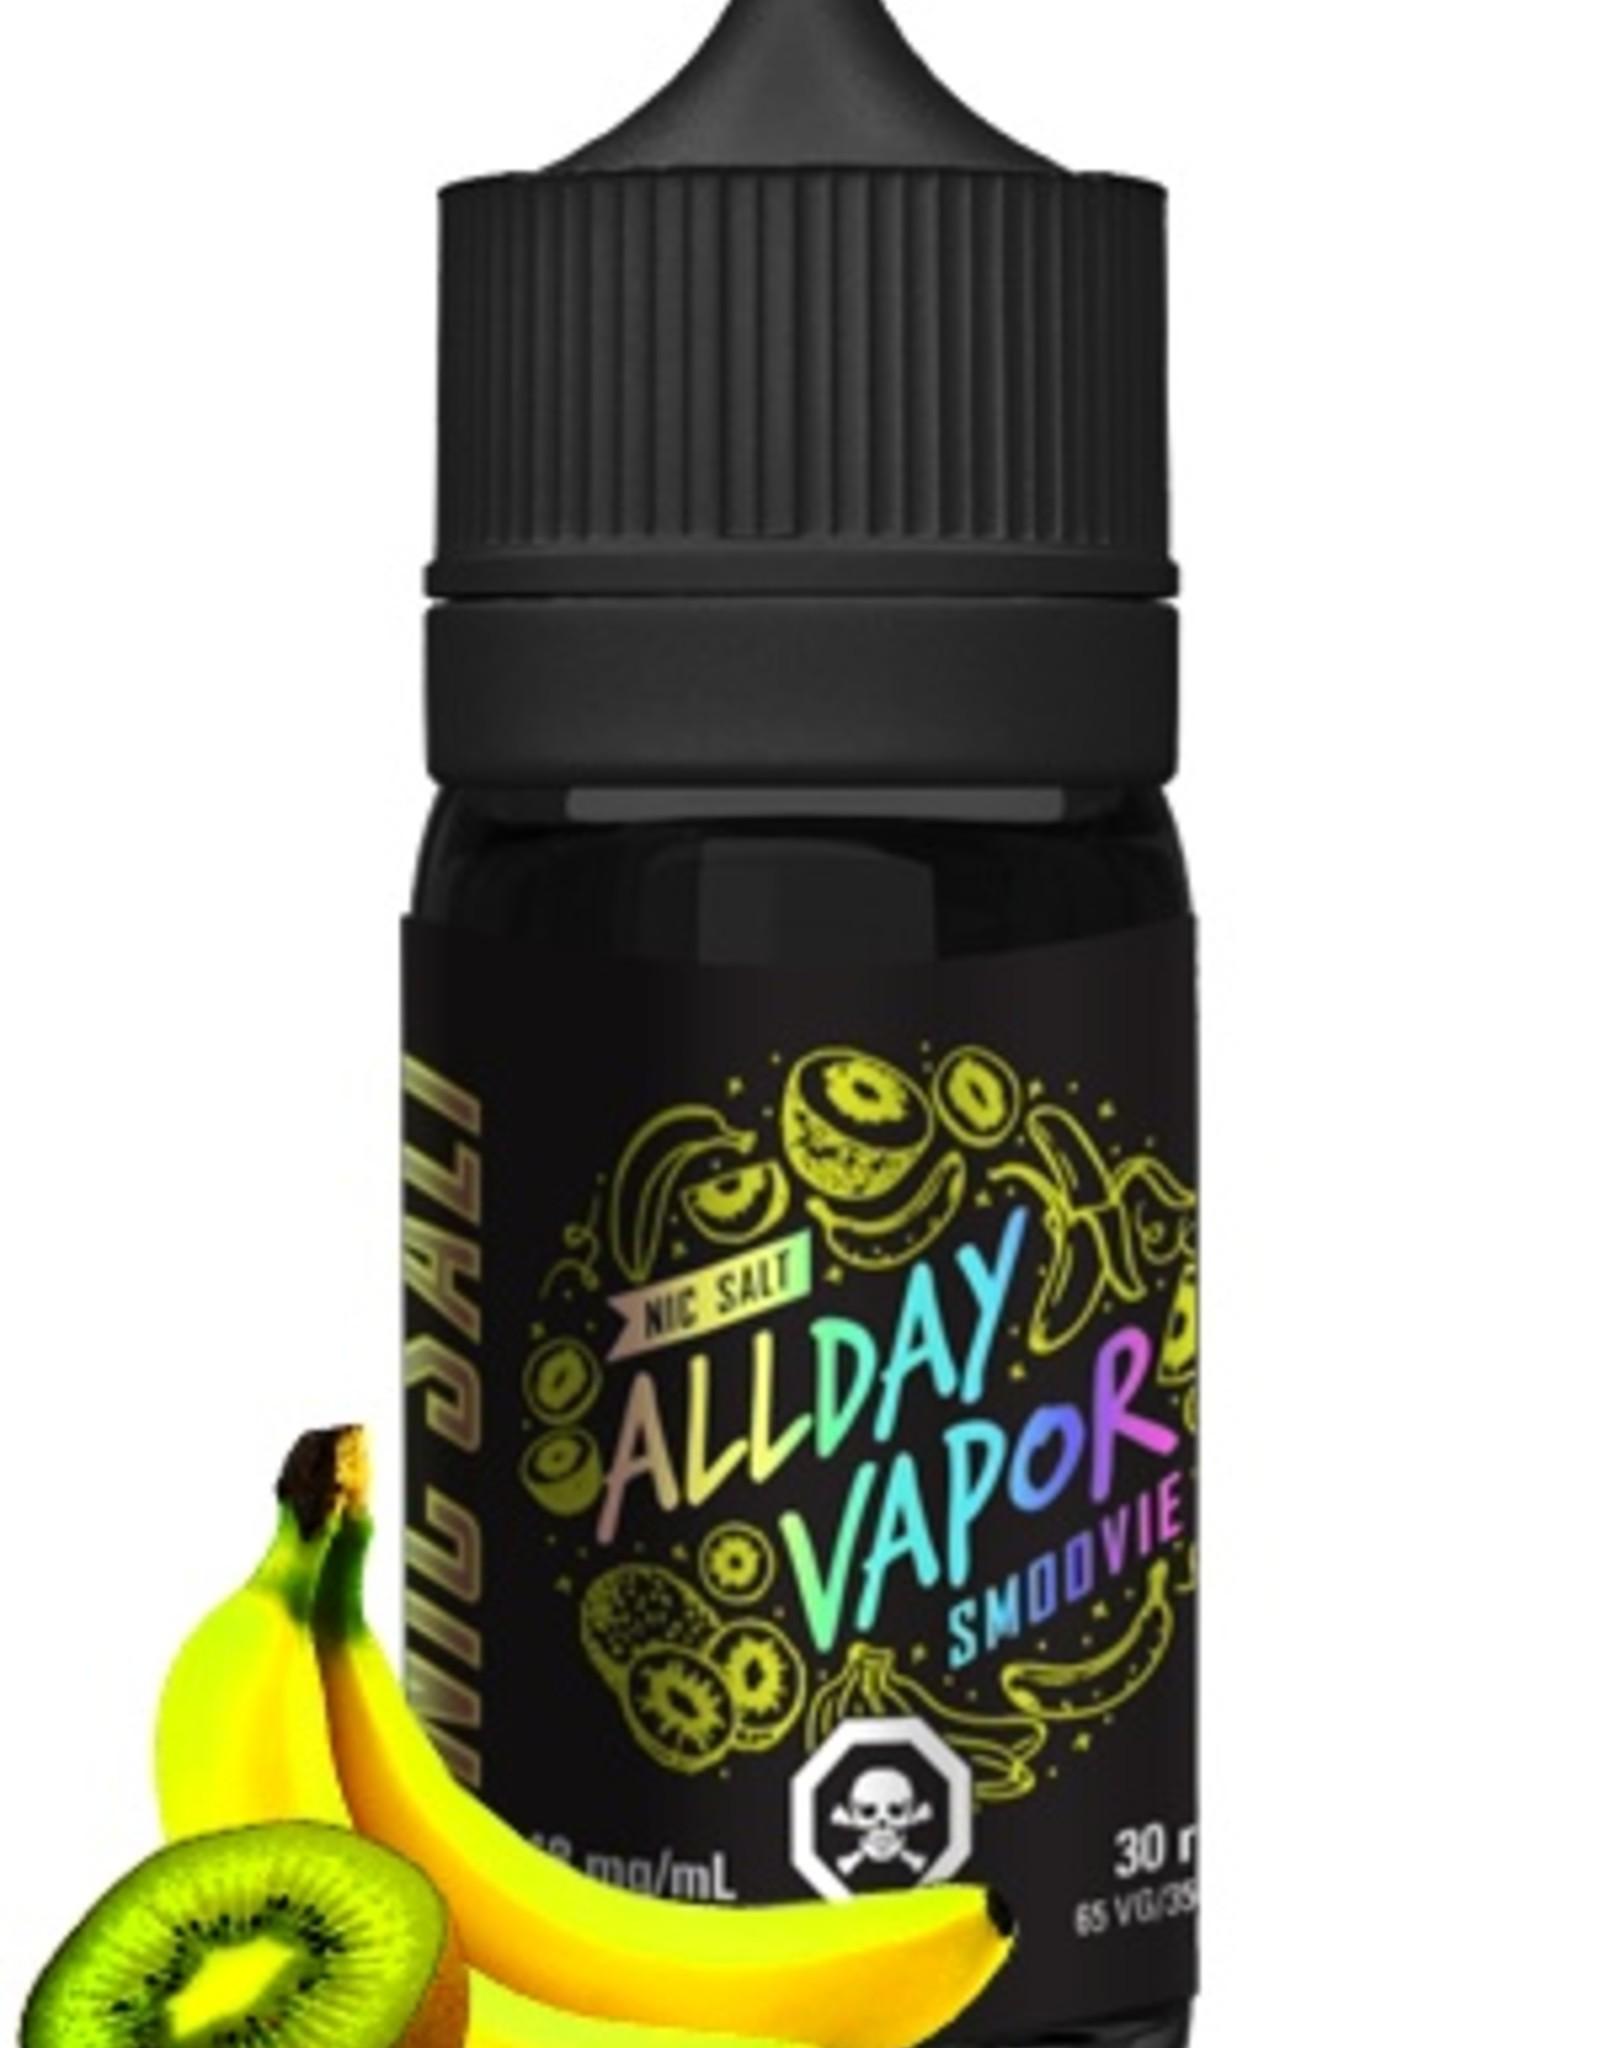 Nic Salt ALLDAY VAPOR Smoovie (30mL)